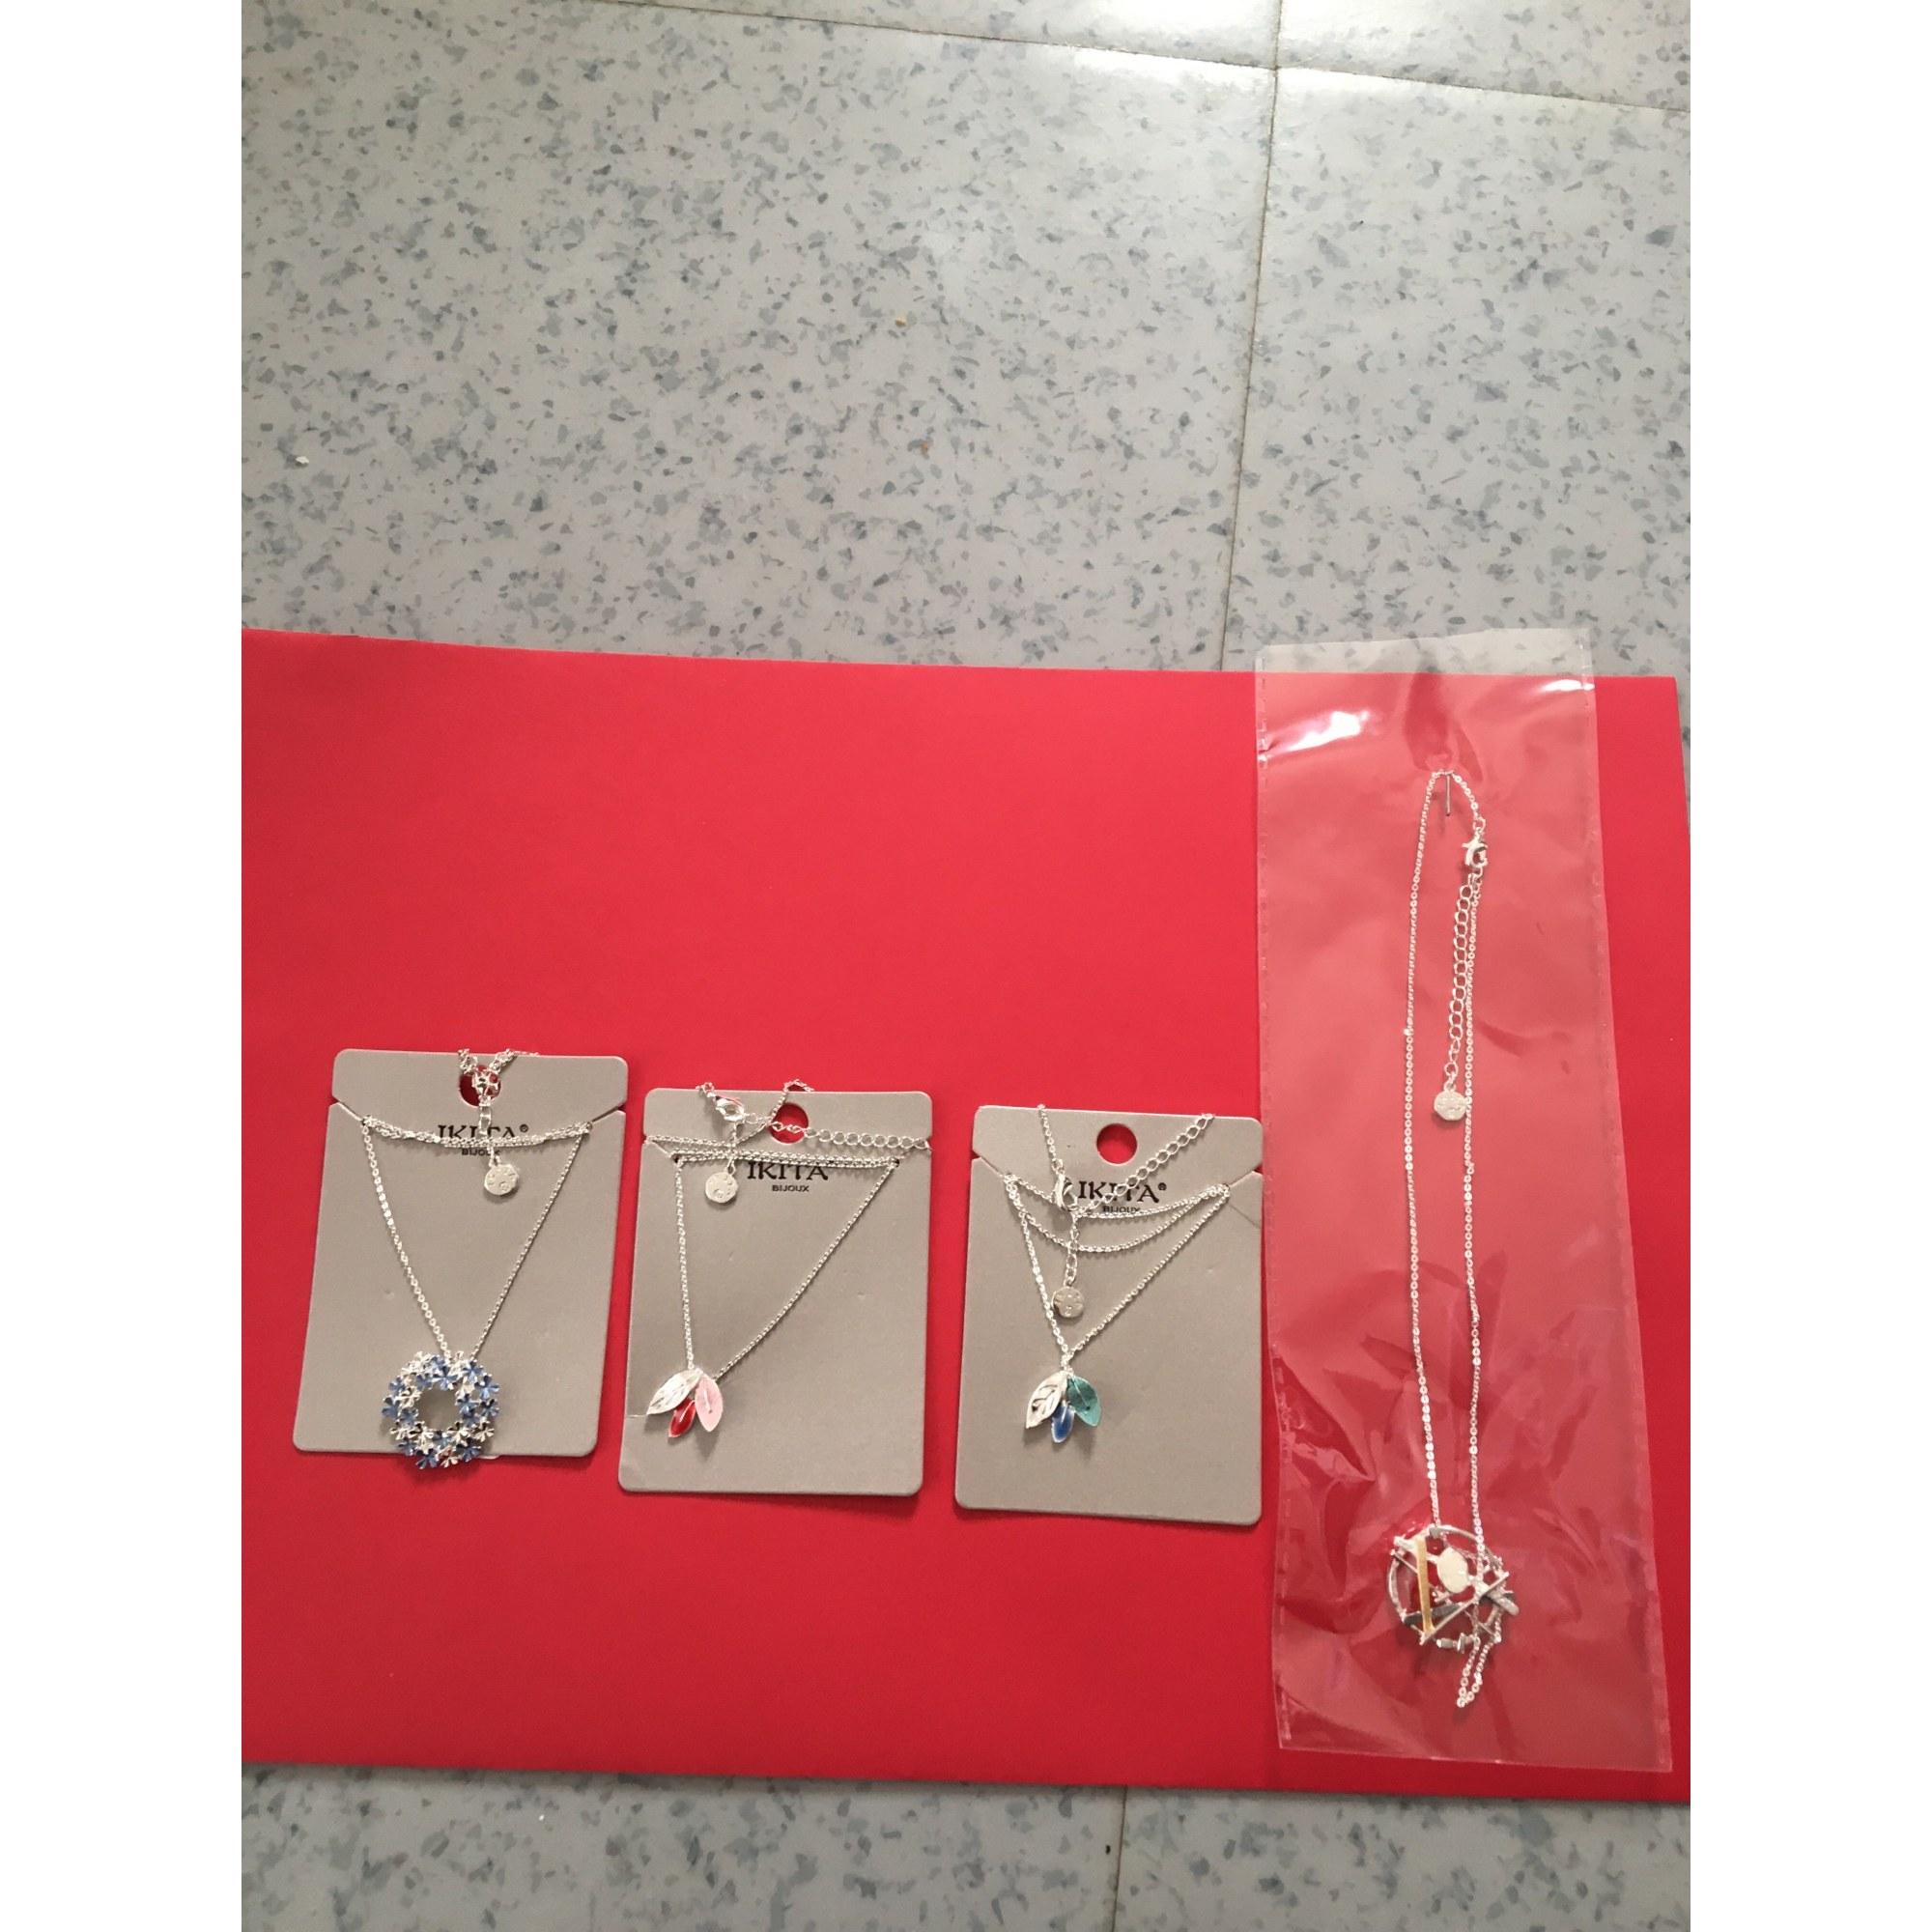 Collier IKITA Multicouleur